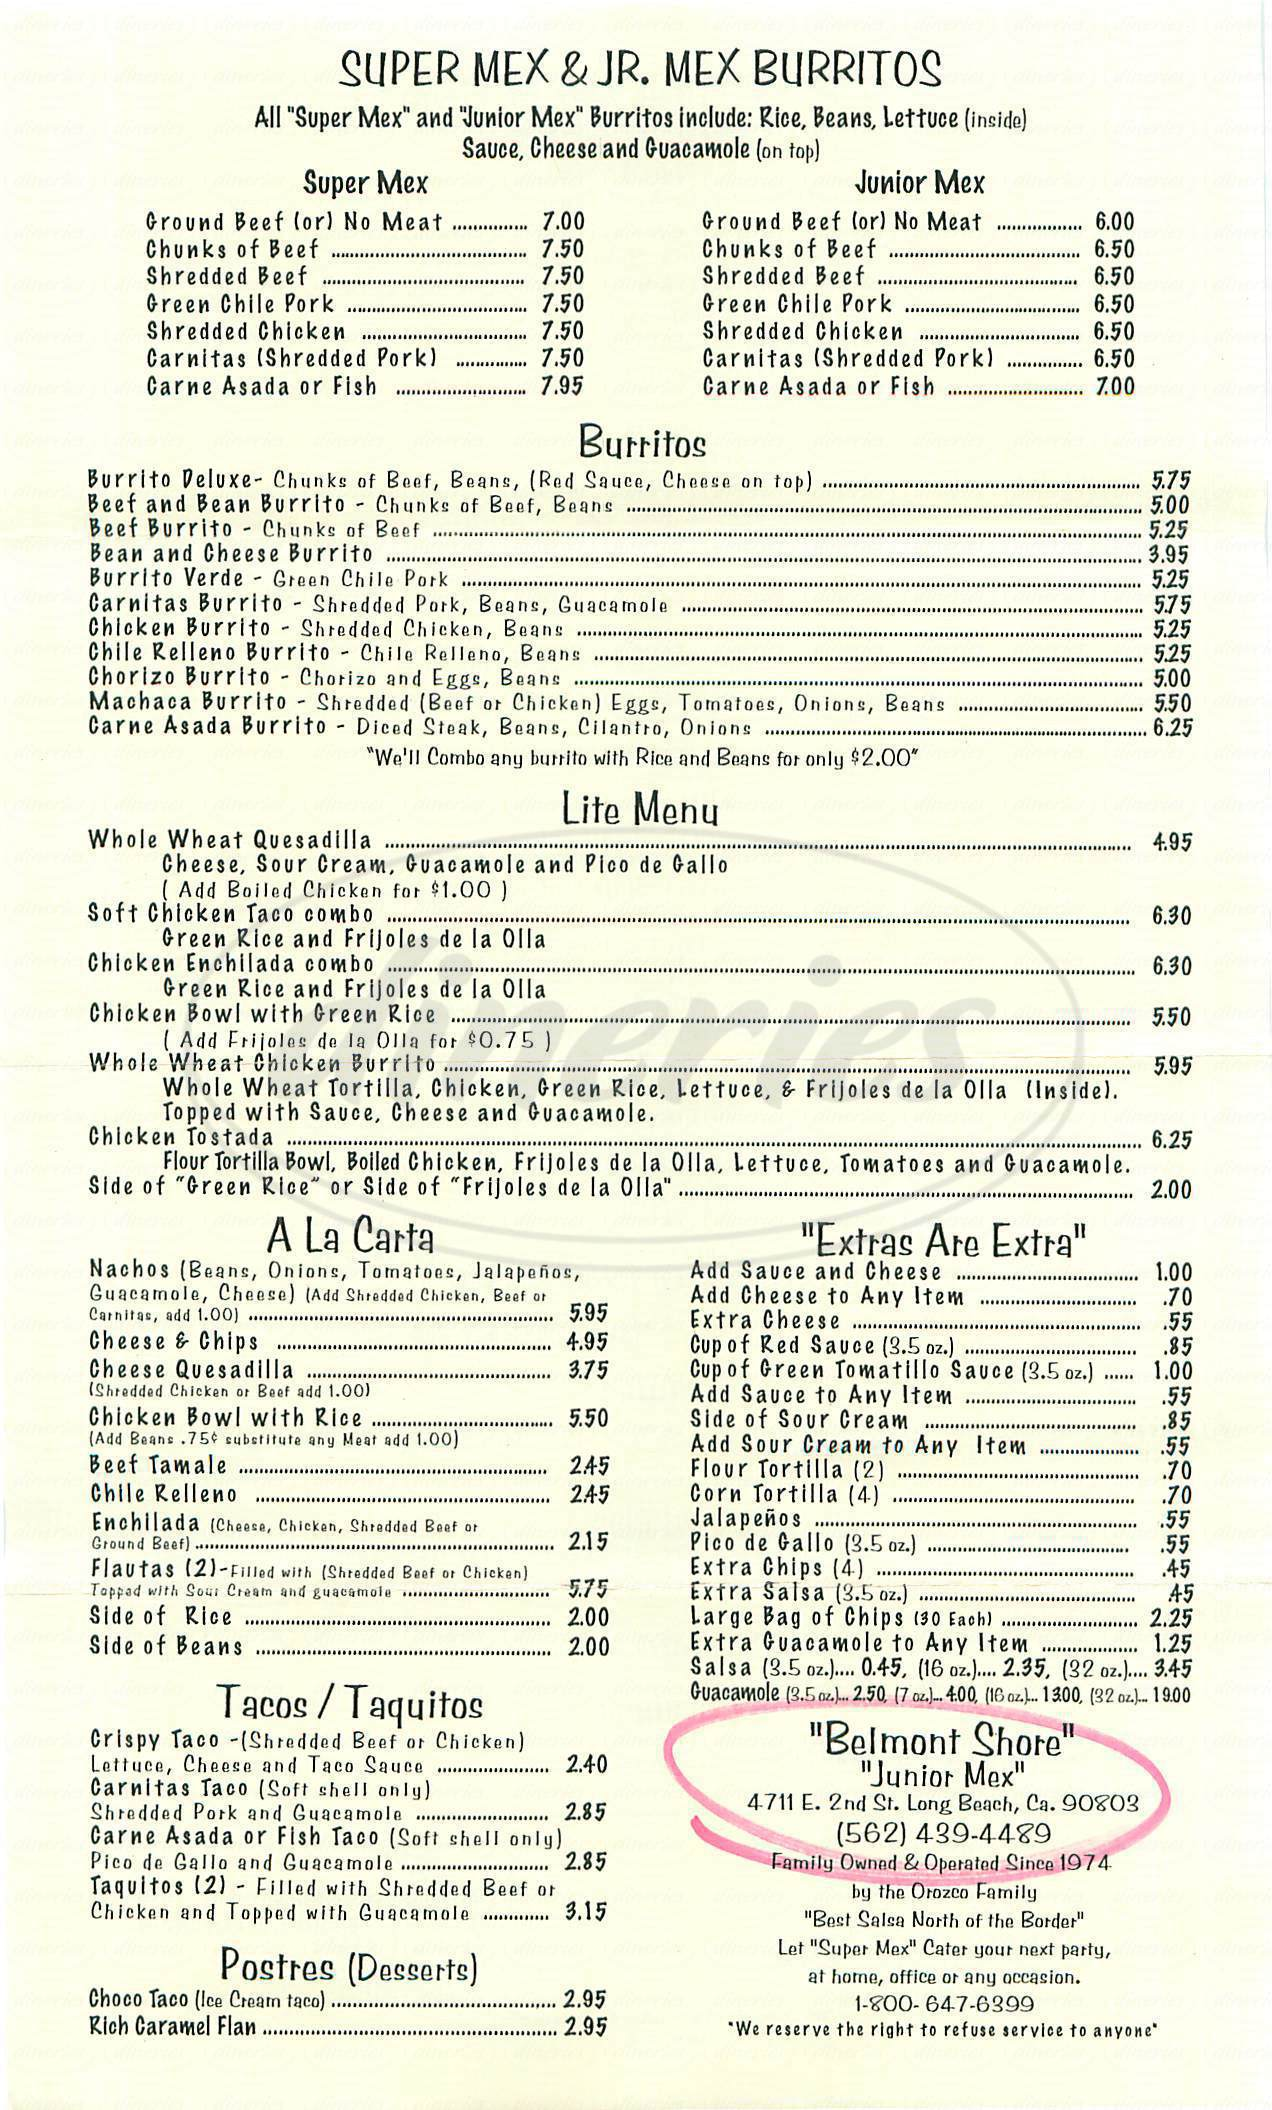 menu for Super Mex